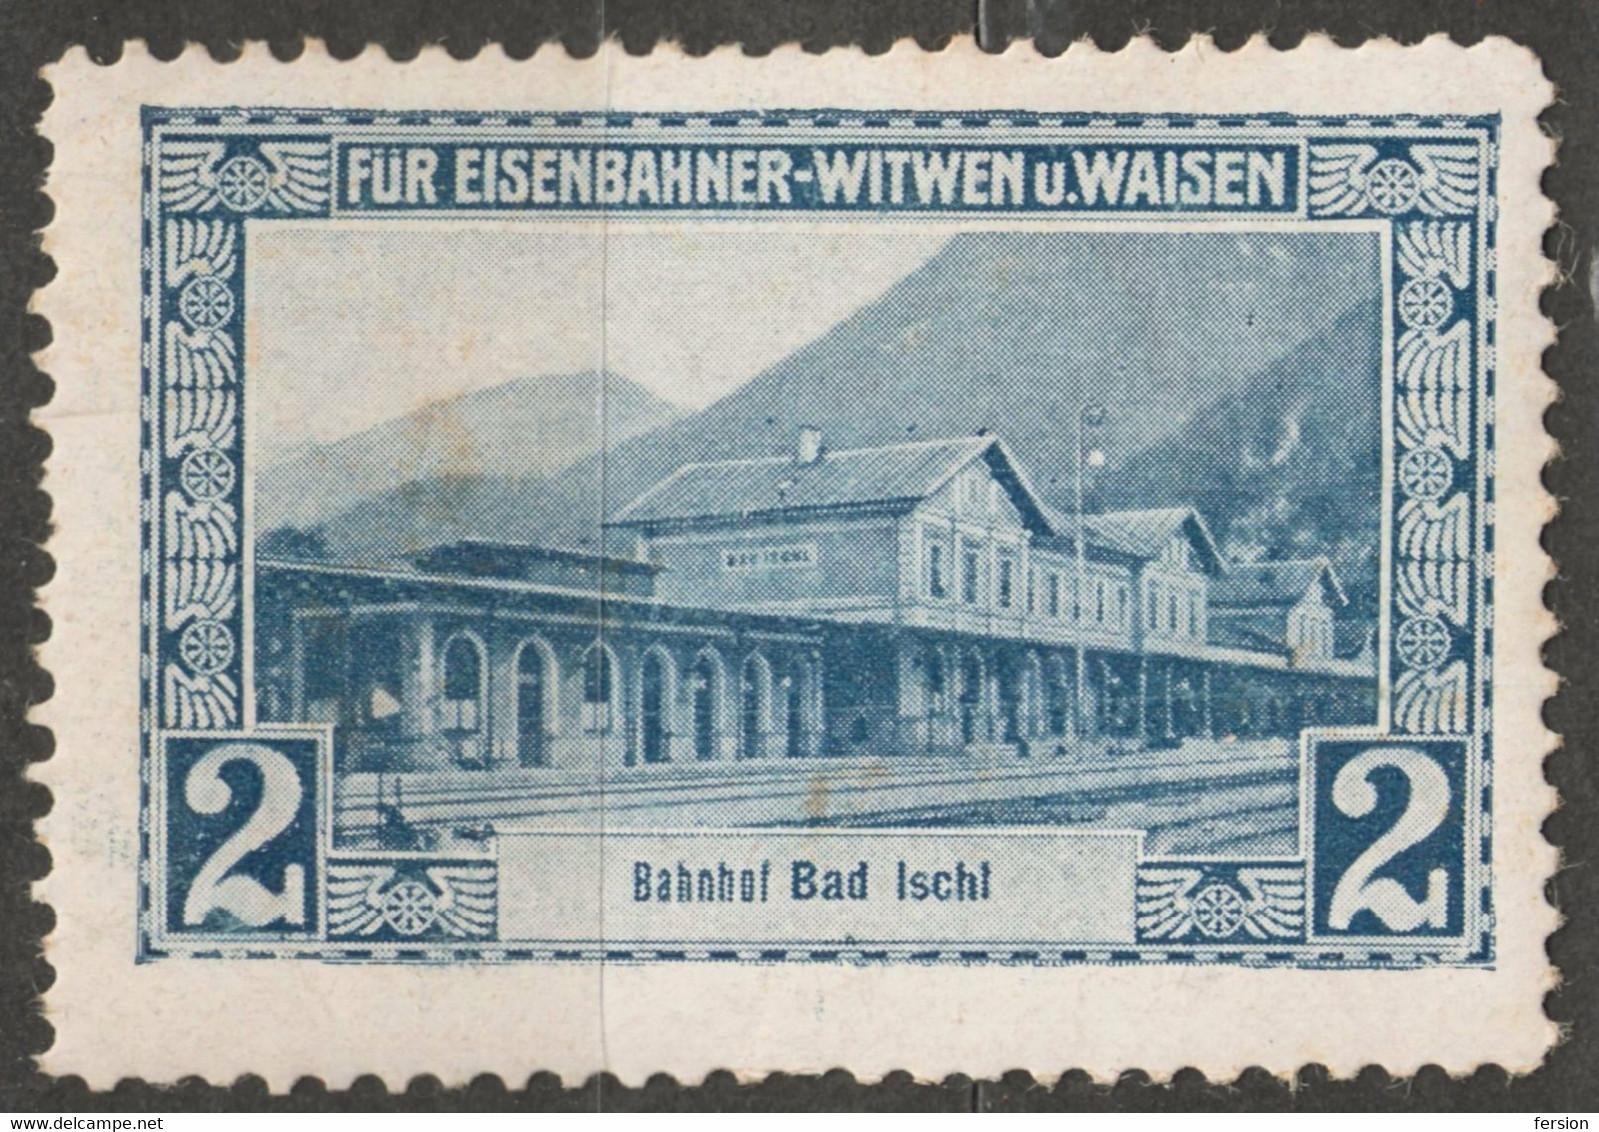 Train Station Bahnhof Bad Ischl BAHNHOF Railway Widow Orphan Austria KuK Charity LABEL CINDERELLA VIGNETTE - Sin Clasificación